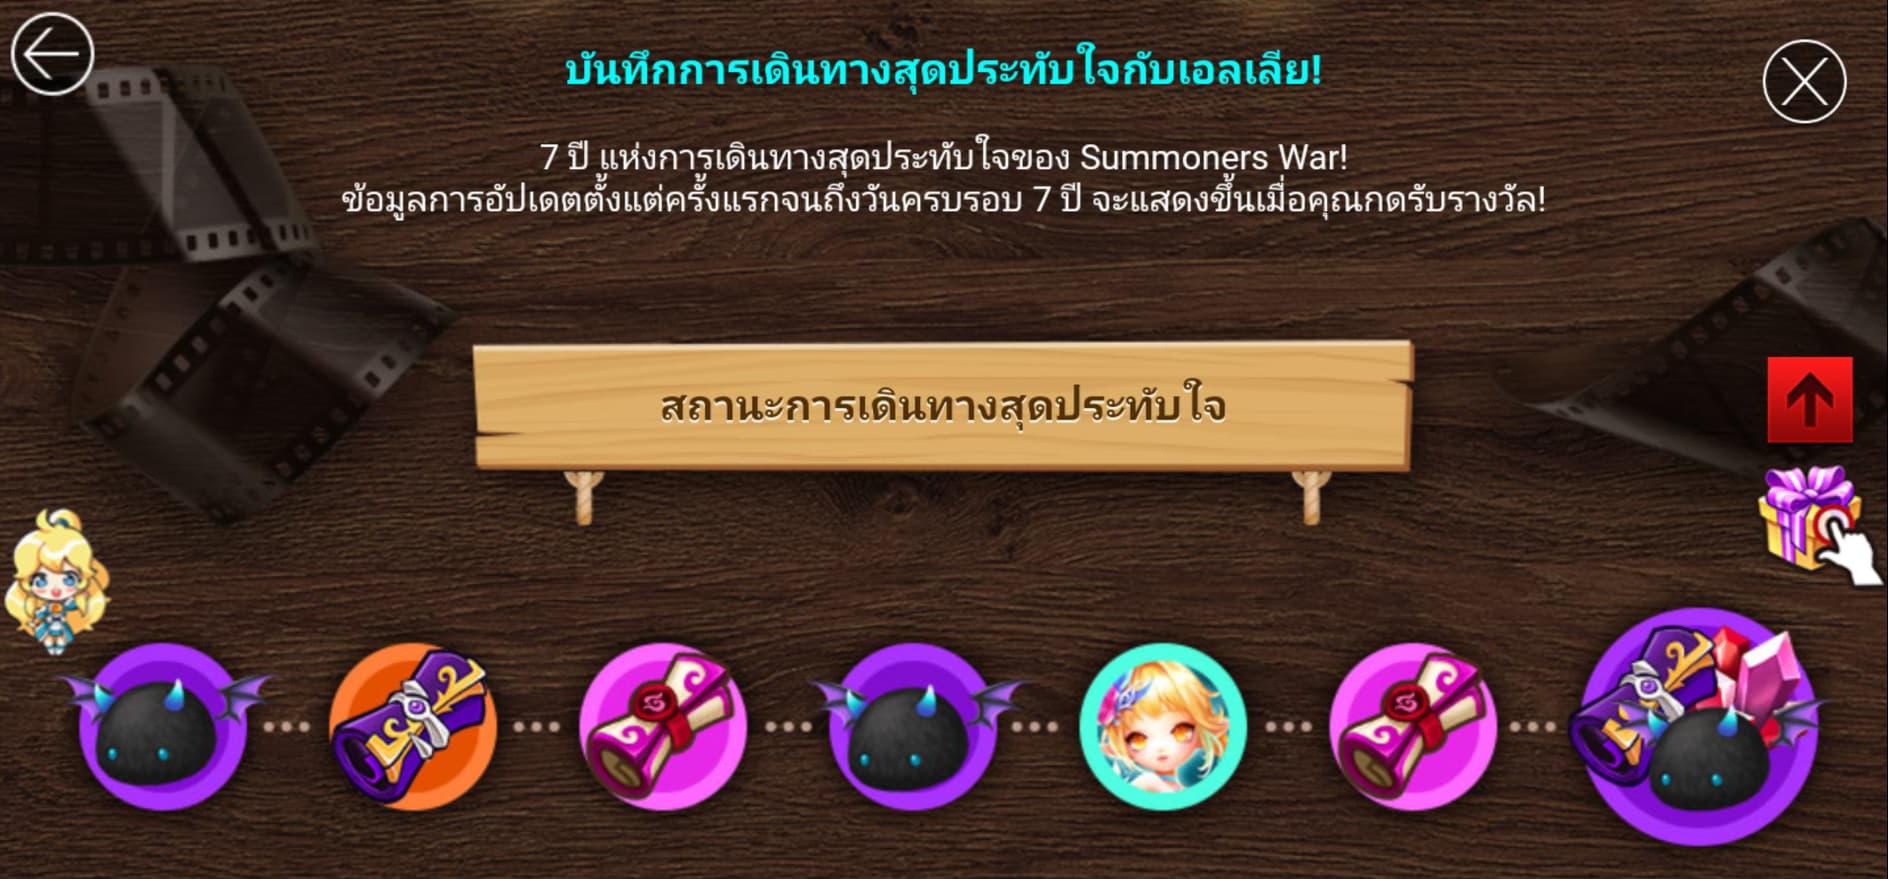 Summoners War 1062021 4